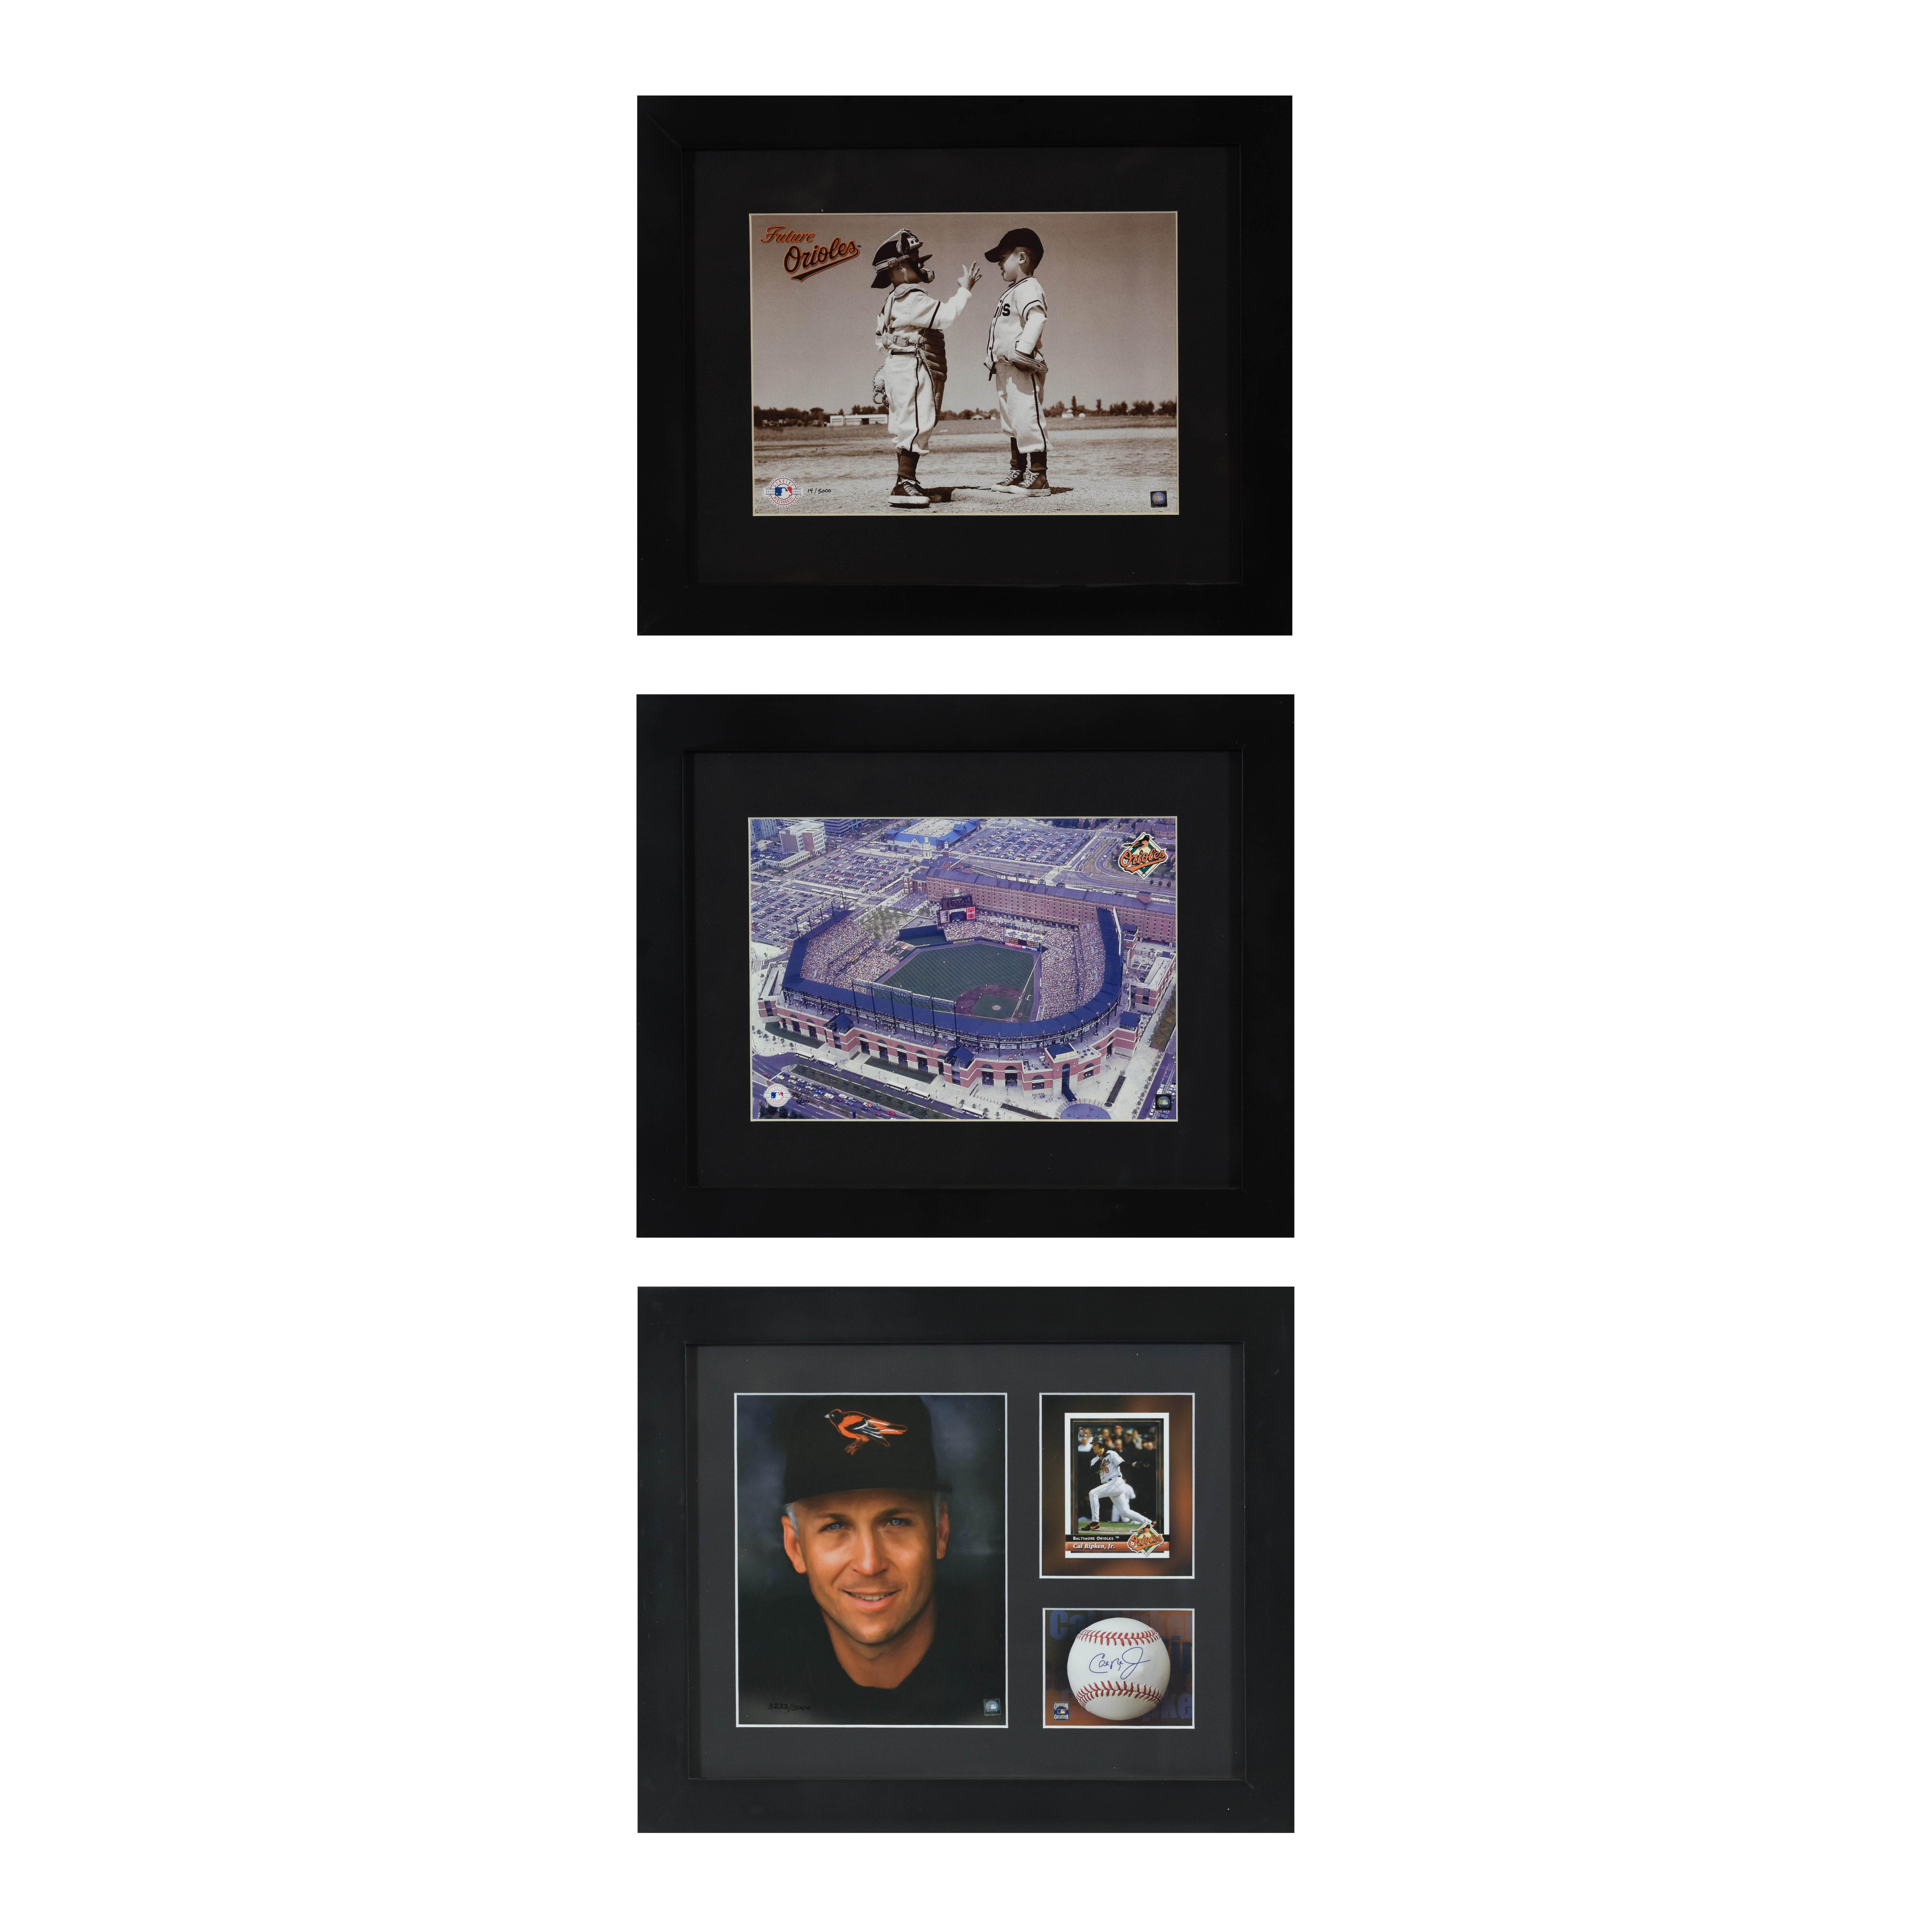 LE Framed Lithographs - Cal Ripken Jr, Camden Yards, and Future Orioles